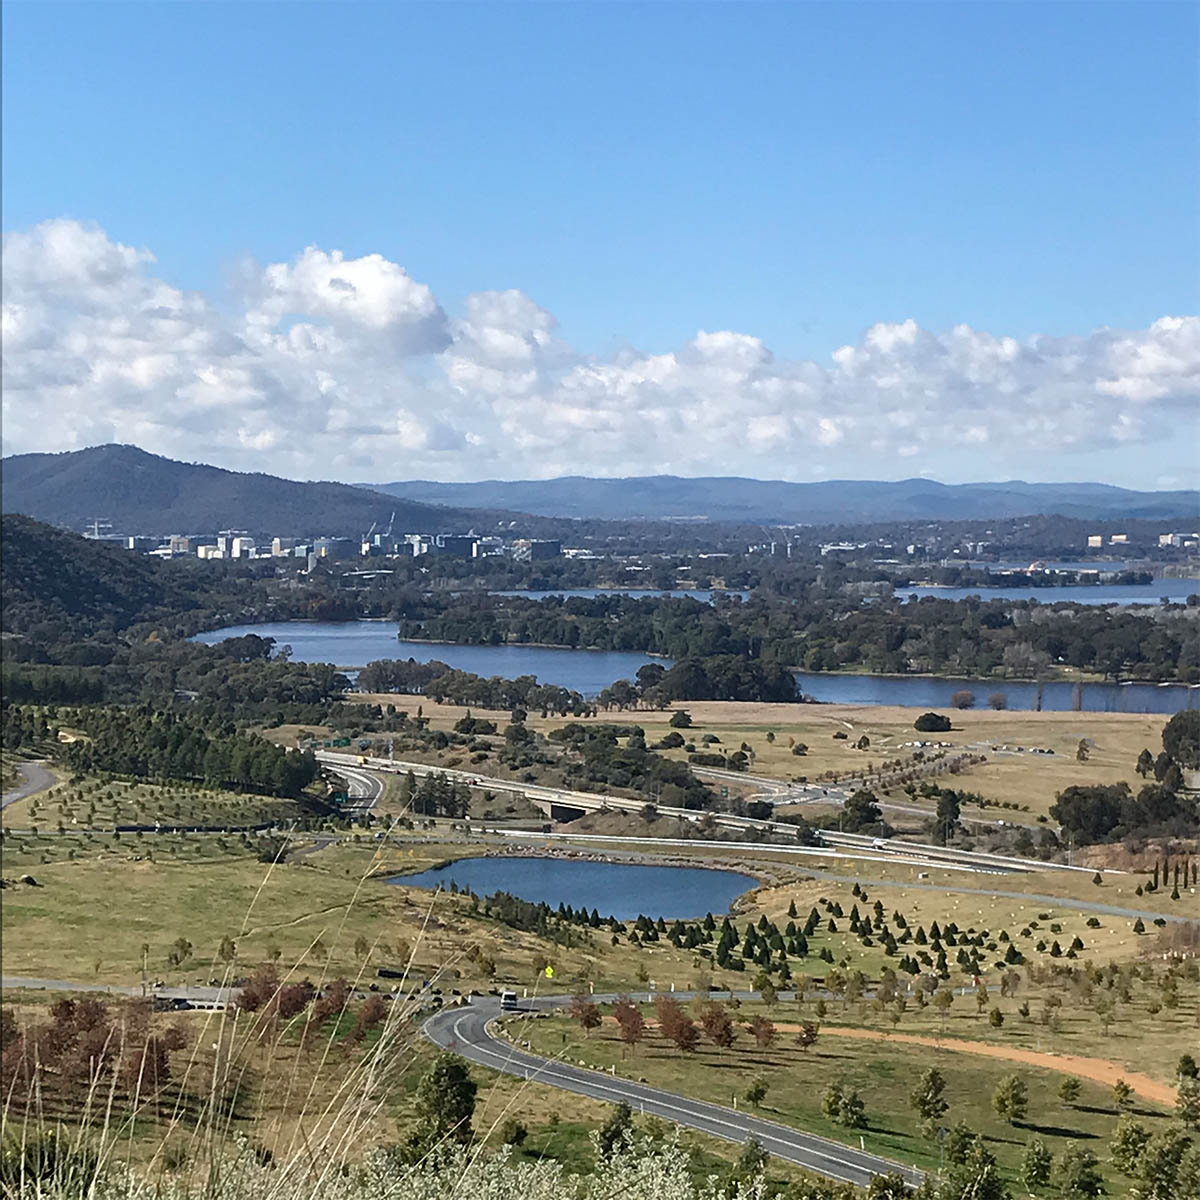 Canberra in a nutshell (or a mushroom cap)